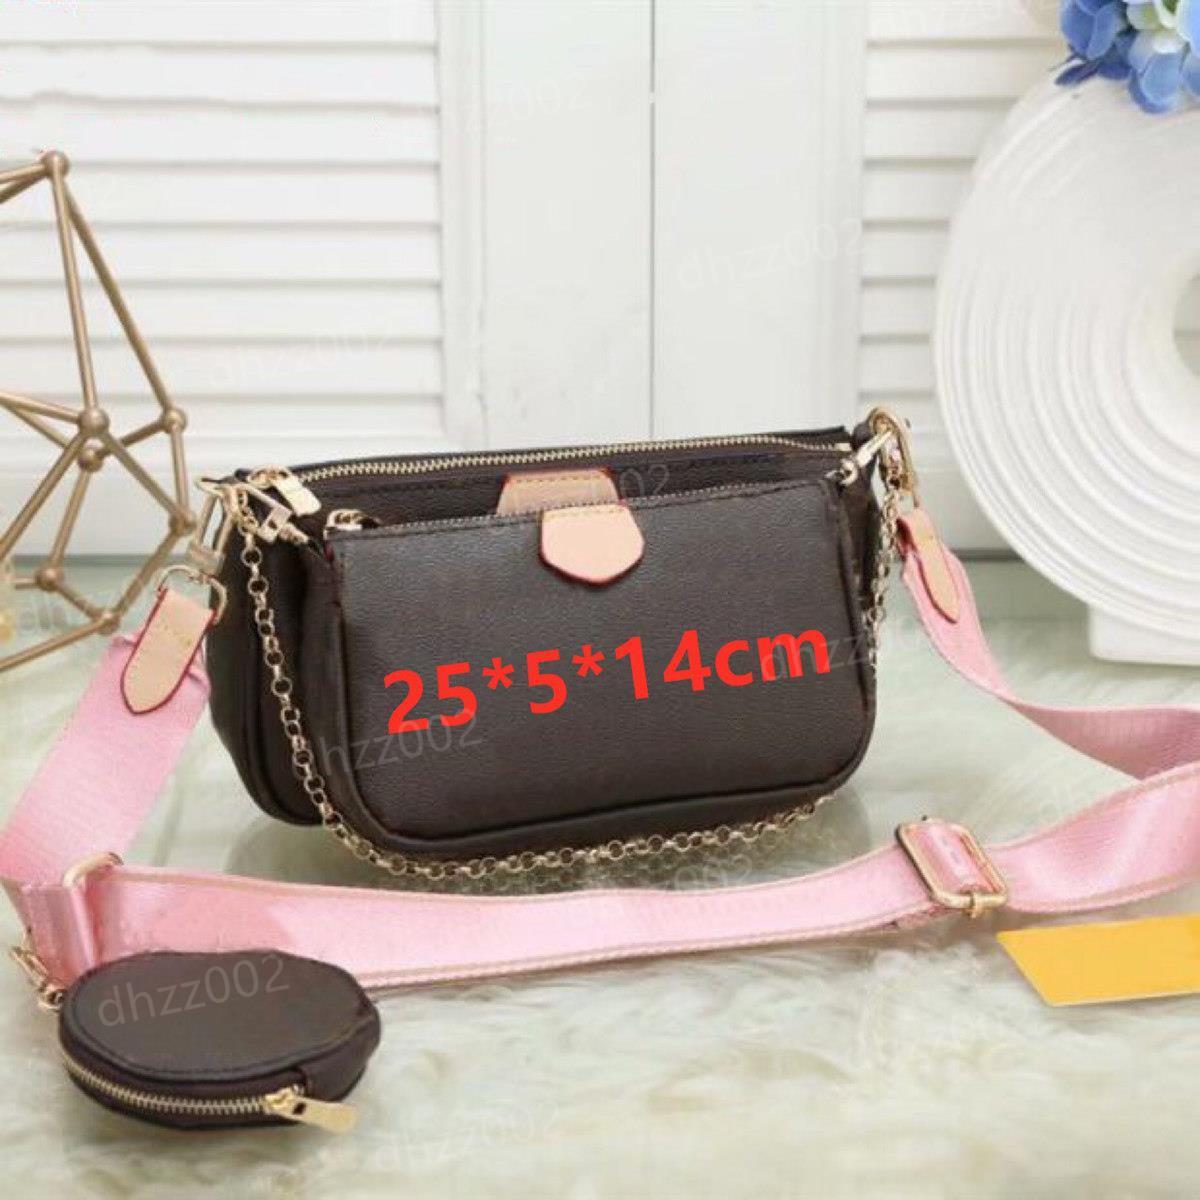 Bolsa Mulheres Bolsas Multi Pochette Bag Corrente Crossbody Bag Moda Pequeno Ombro Bag 3 Pcs Bolsa Multi Cor Straps EWFGSDGD